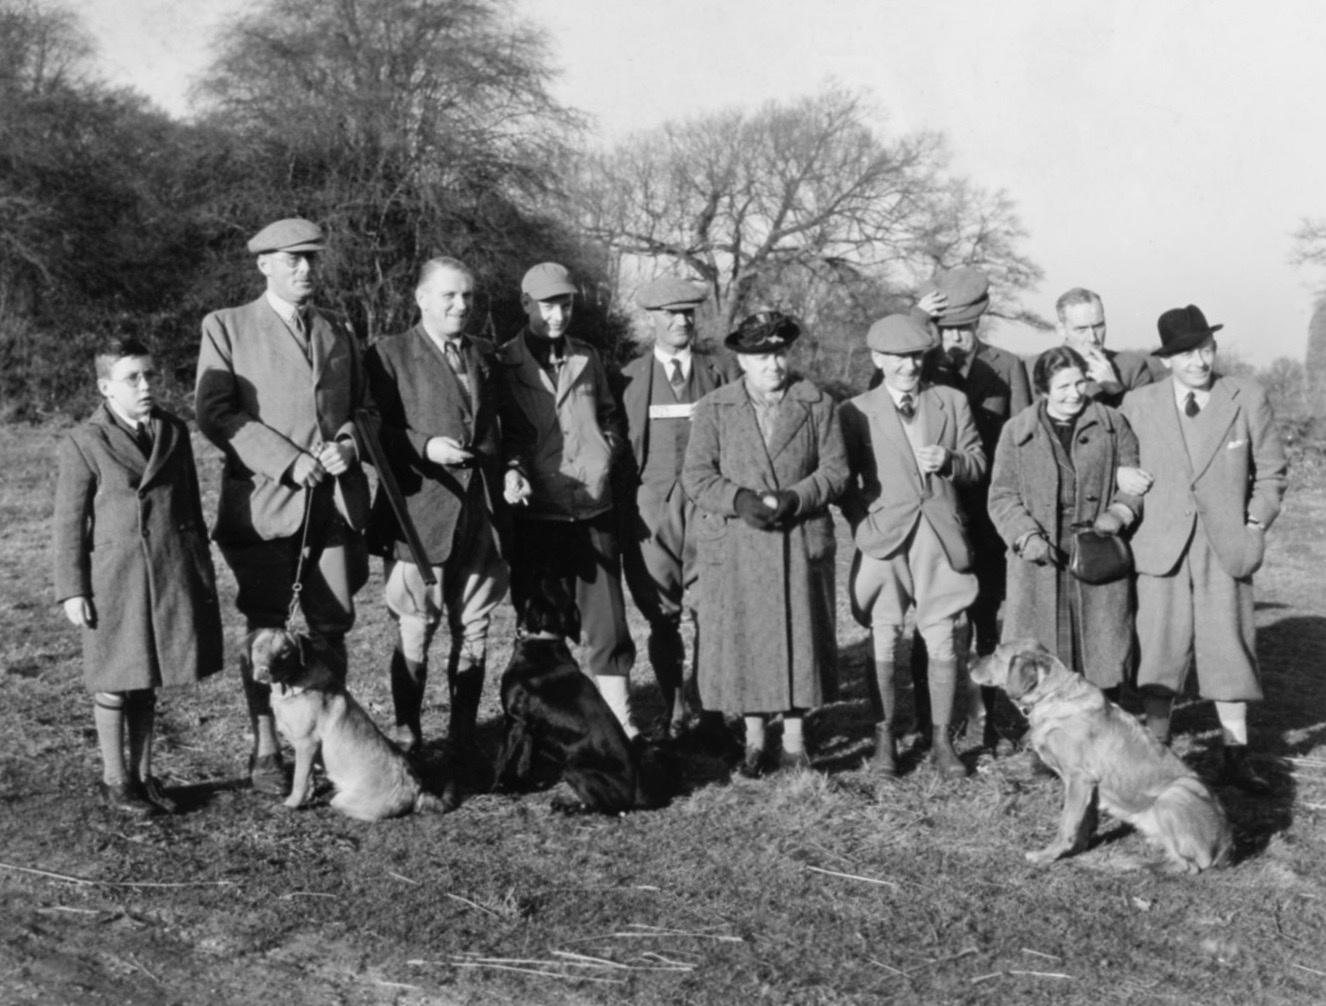 Three generations of Gough's at Lackford Shoot in December 1942